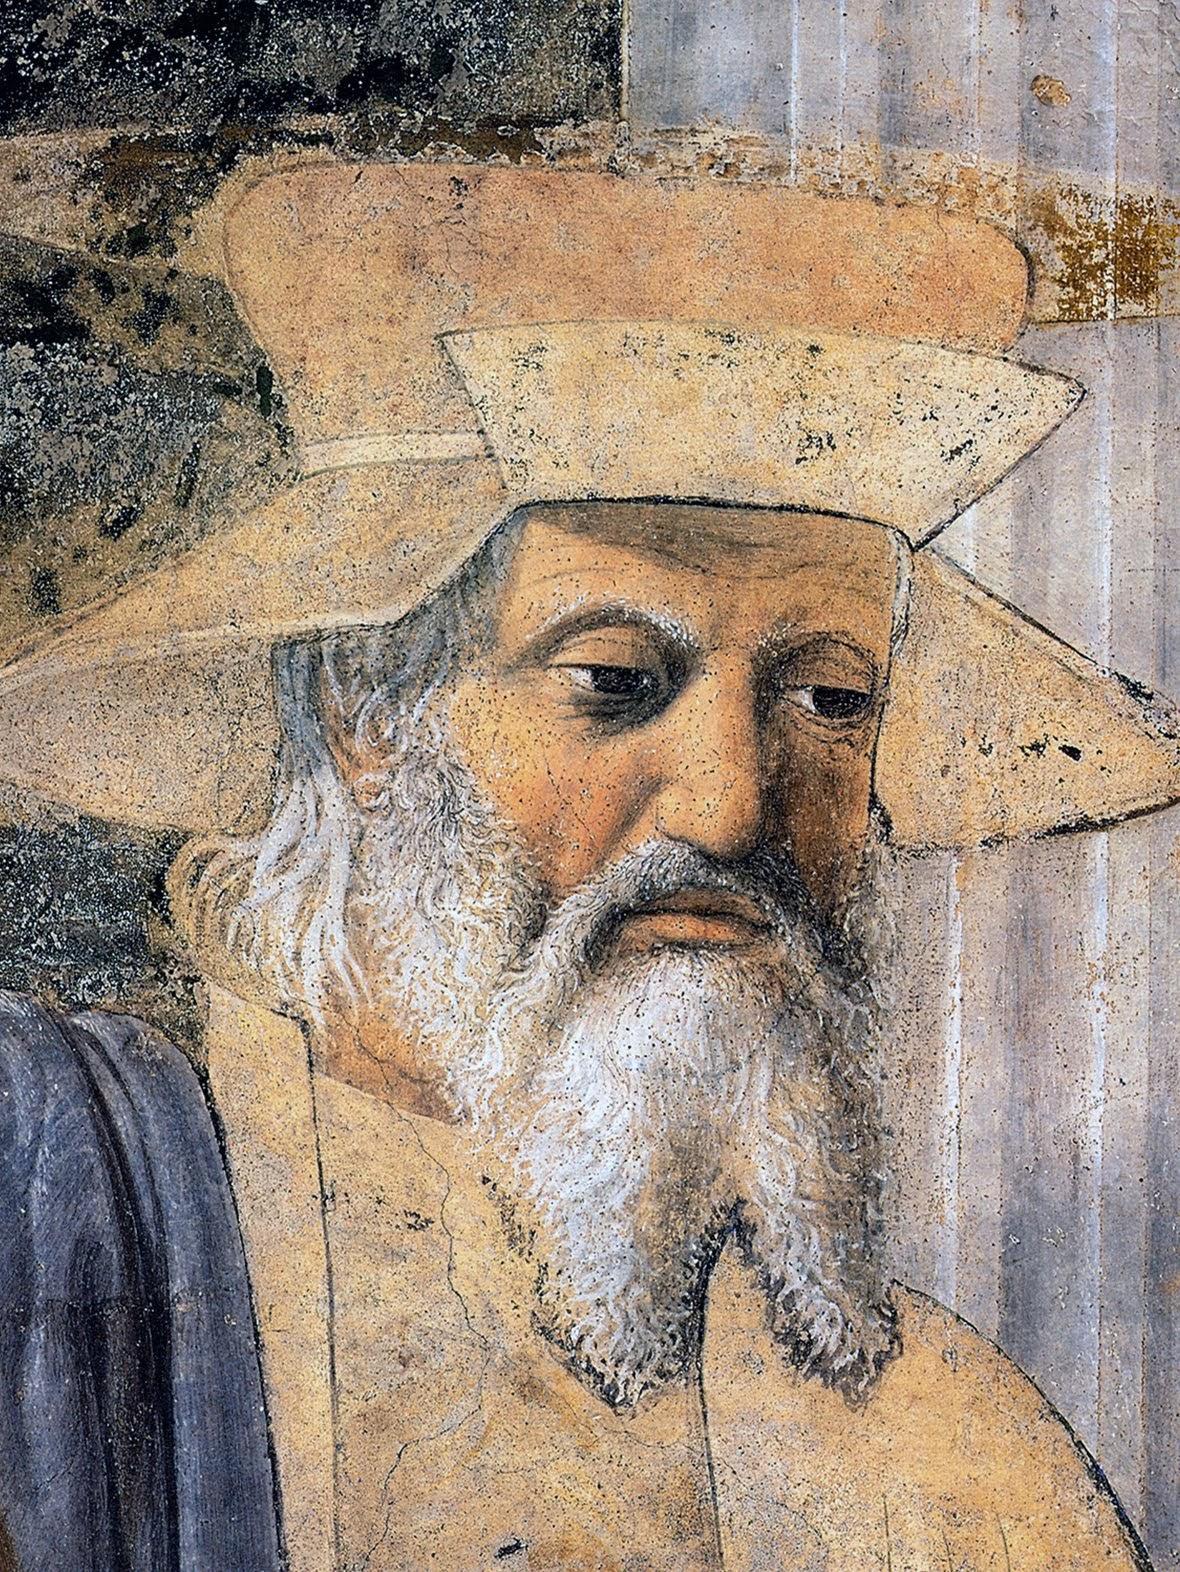 Piero della Francesca, Sigismondo Pandolfo Malatesta in preghiera davanti a san Sigismondo, 1451, particolare Sigismondo Pandolfo Malatesta, Tempio Malatestiano, Rimini